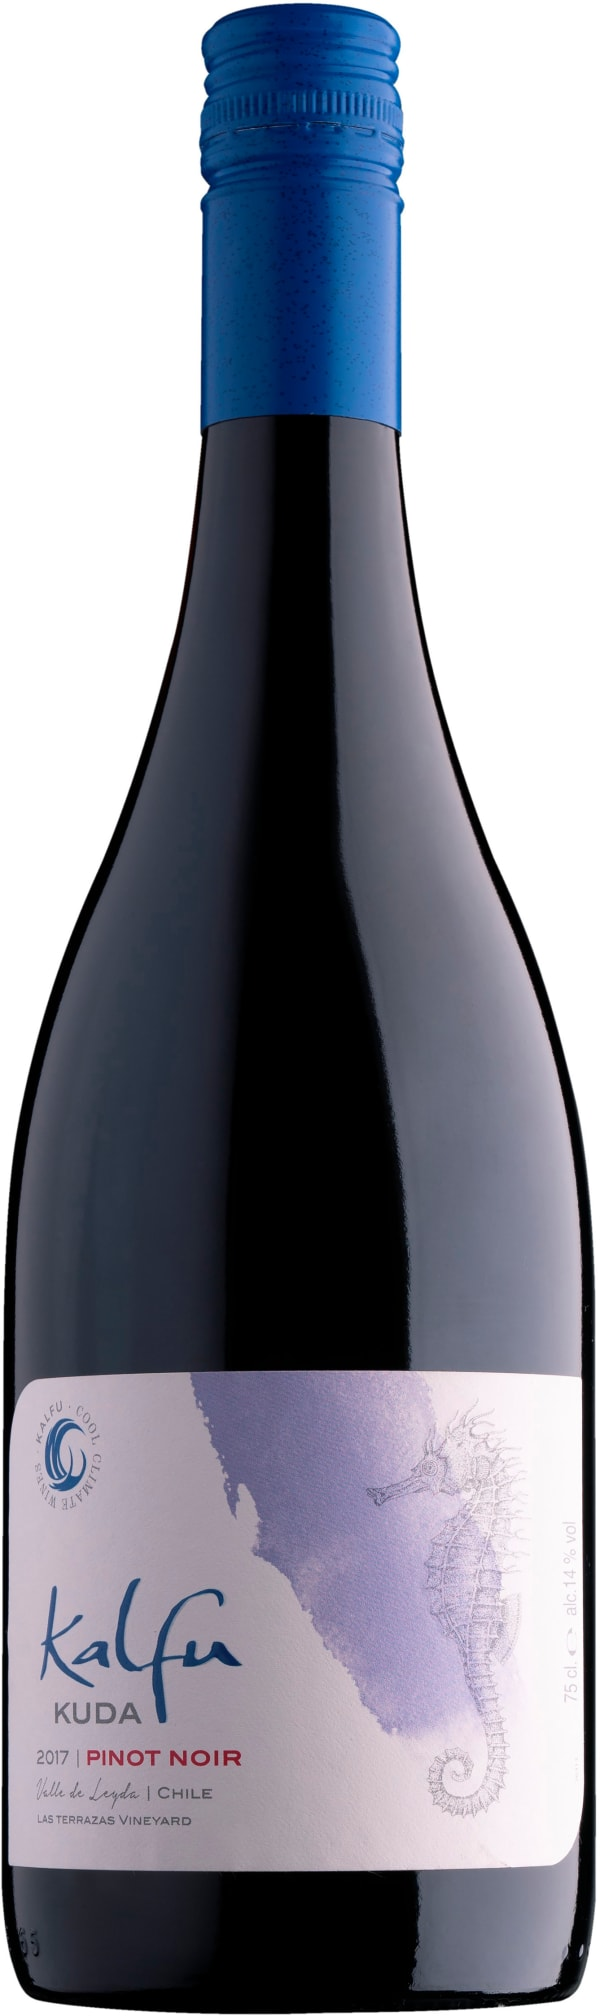 Kalfu Kuda Pinot Noir 2017